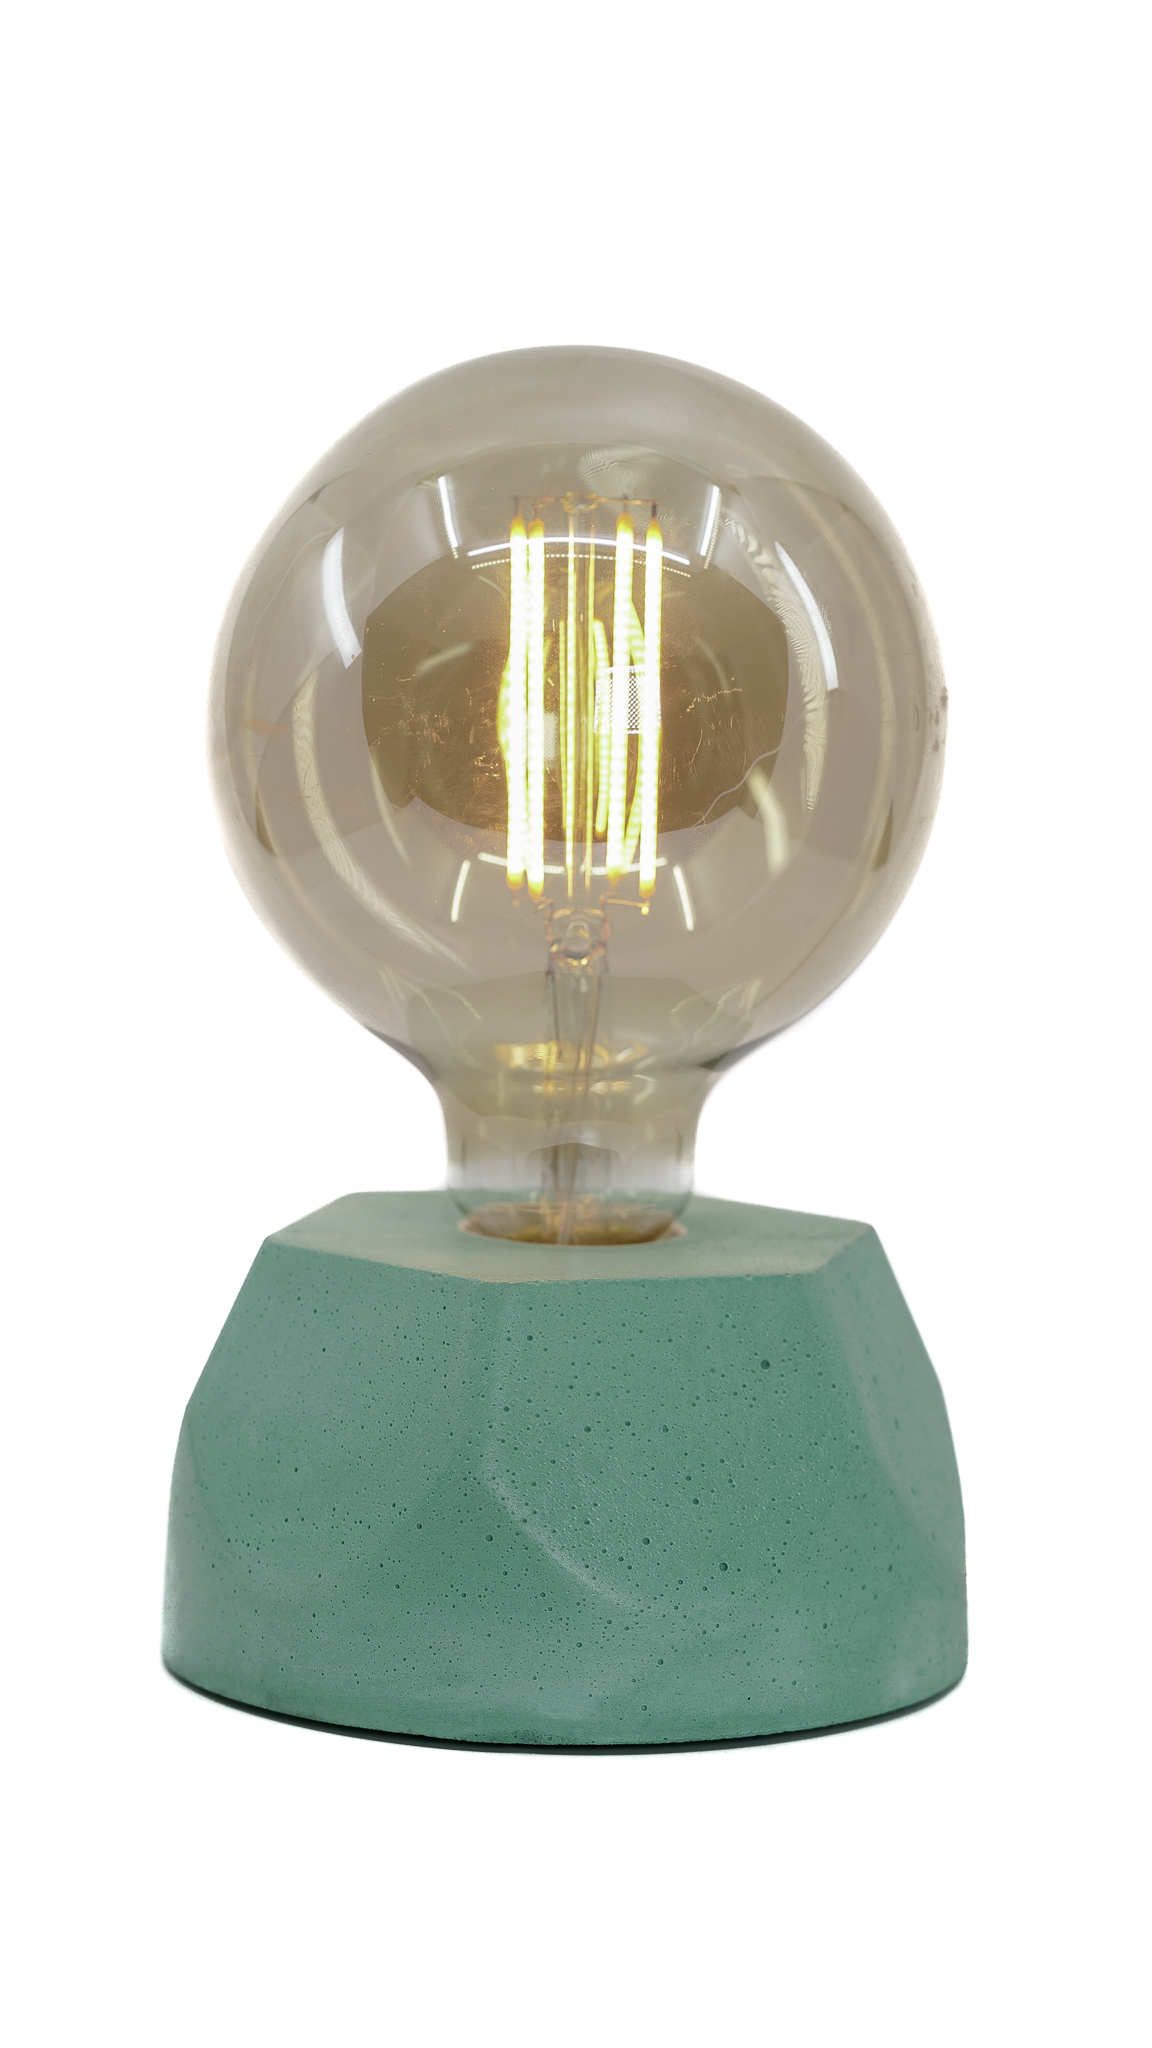 Lampe hexagone en béton turquoise fabrication artisanale